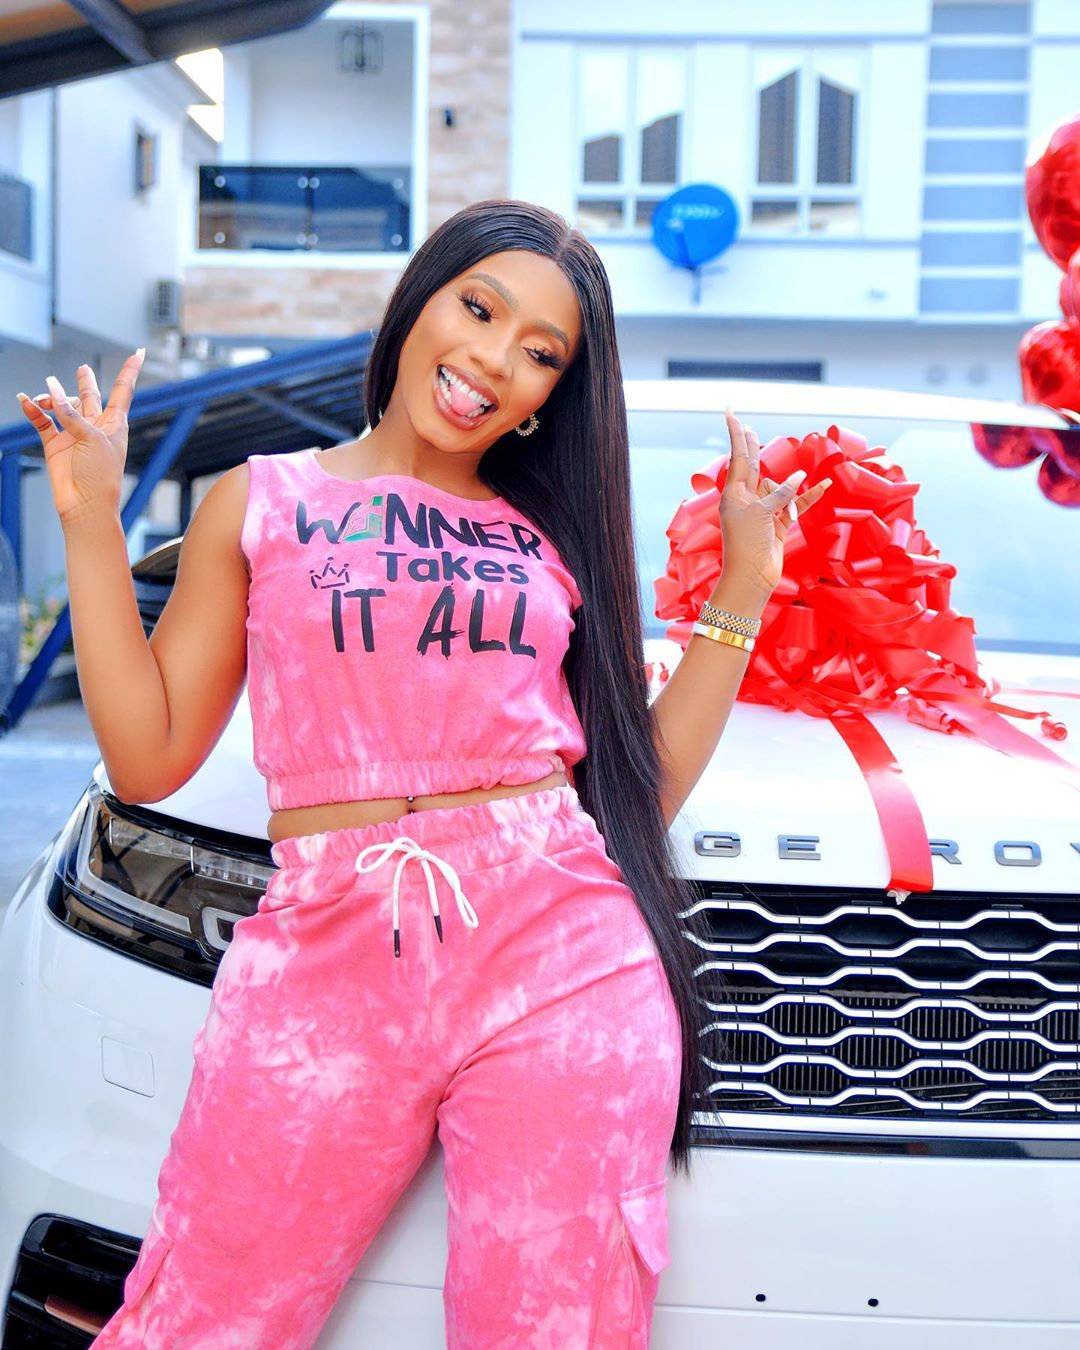 Mercy Eke Buys Herself New Range Rover Velar To Celebrate Her 27th Birthday